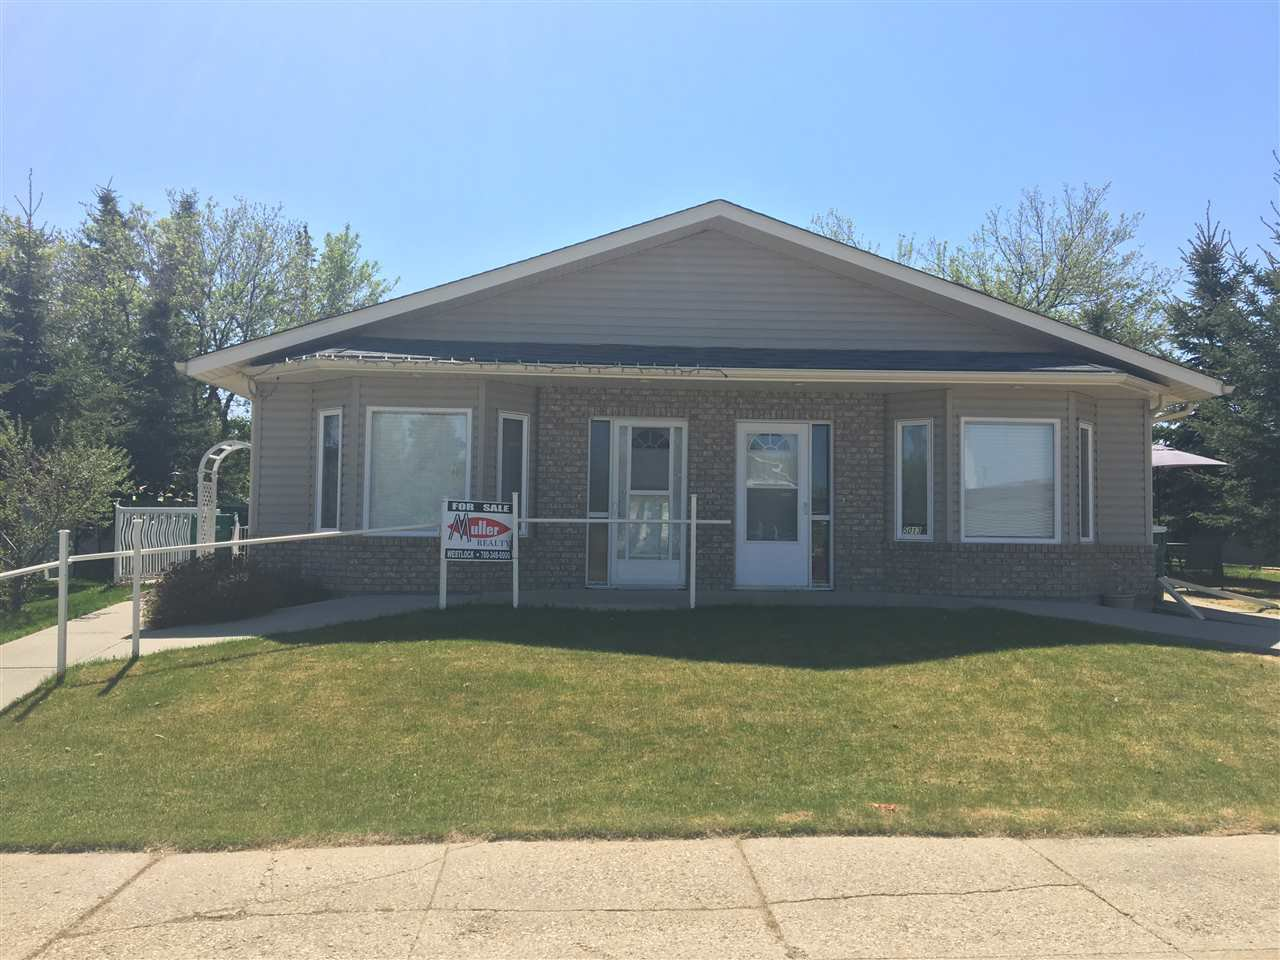 Main Photo: 5013A 50 Avenue: Clyde House Half Duplex for sale : MLS®# E4101831